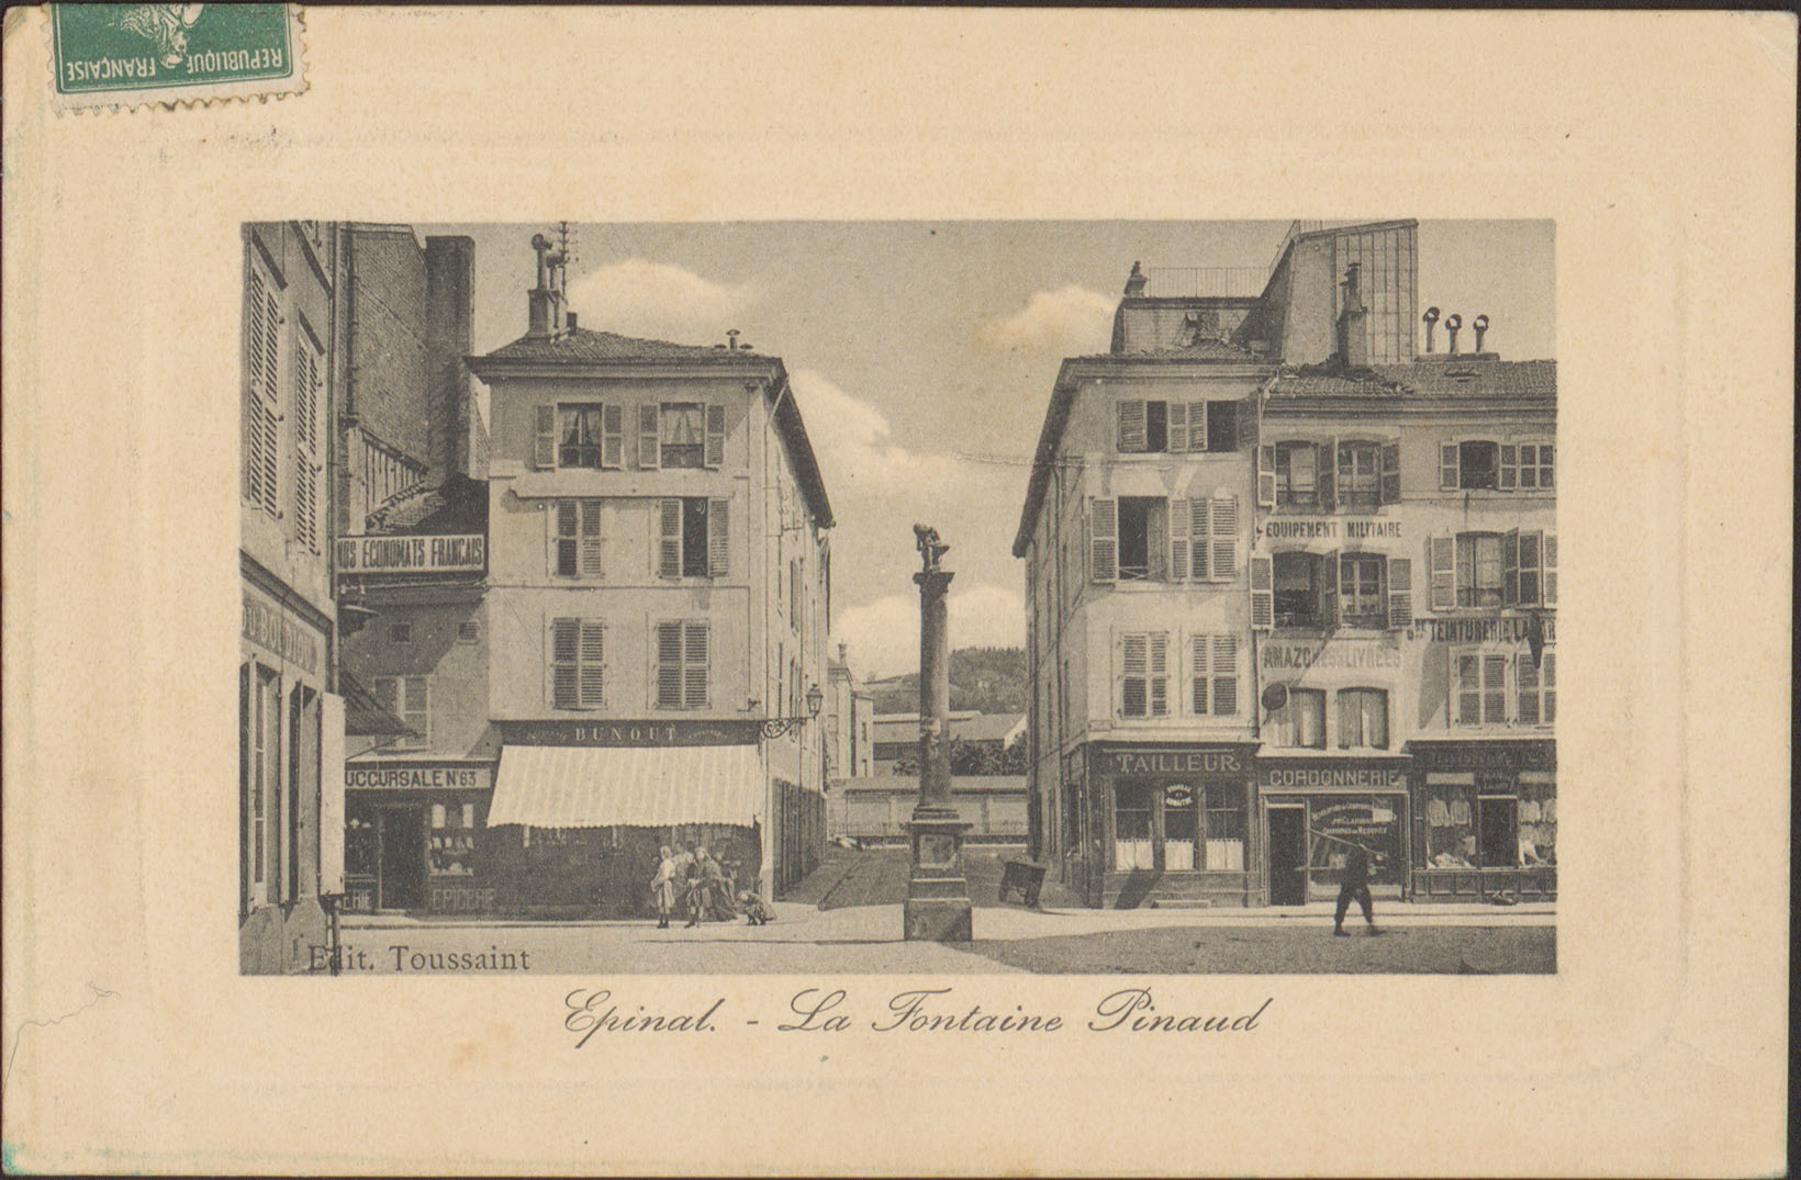 Contenu du Épinal, La Fontaine Pinau